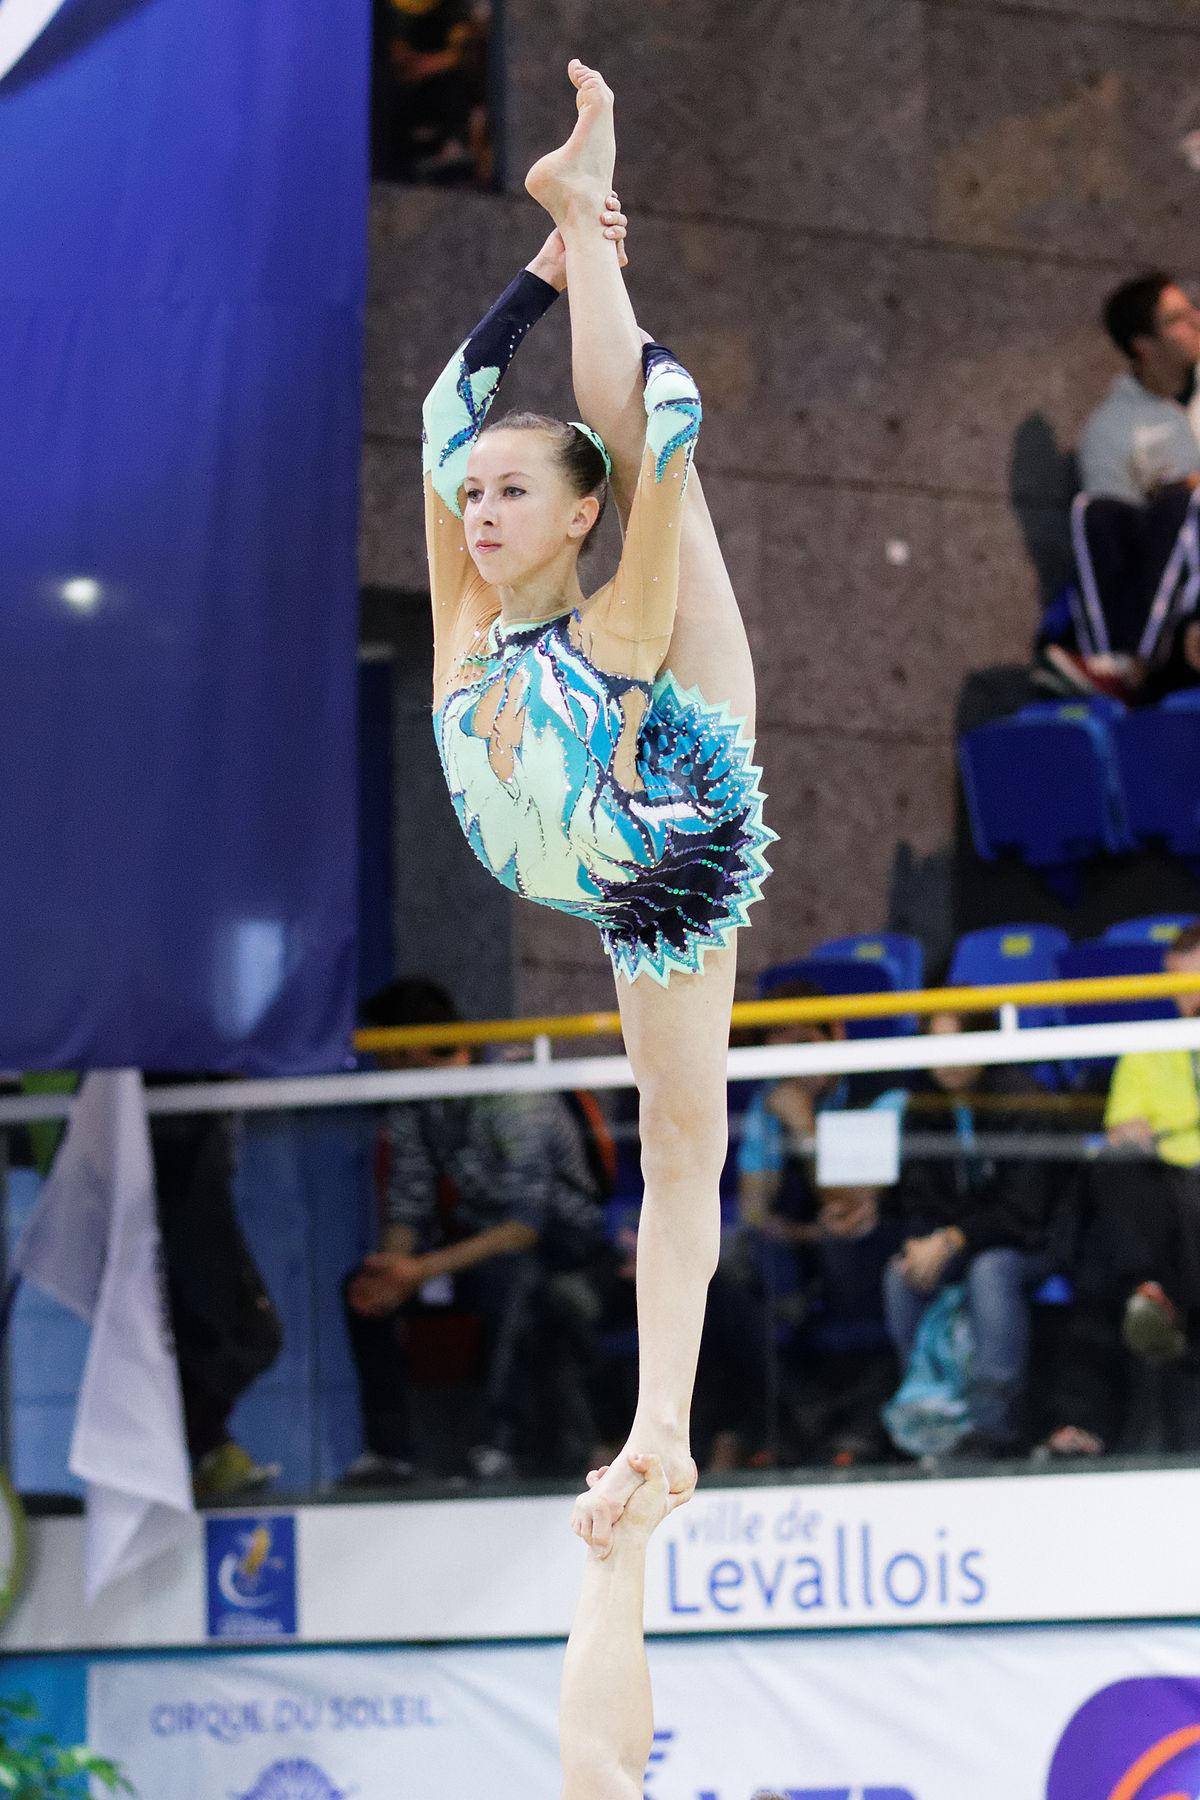 Gymnastics - Wikipedia